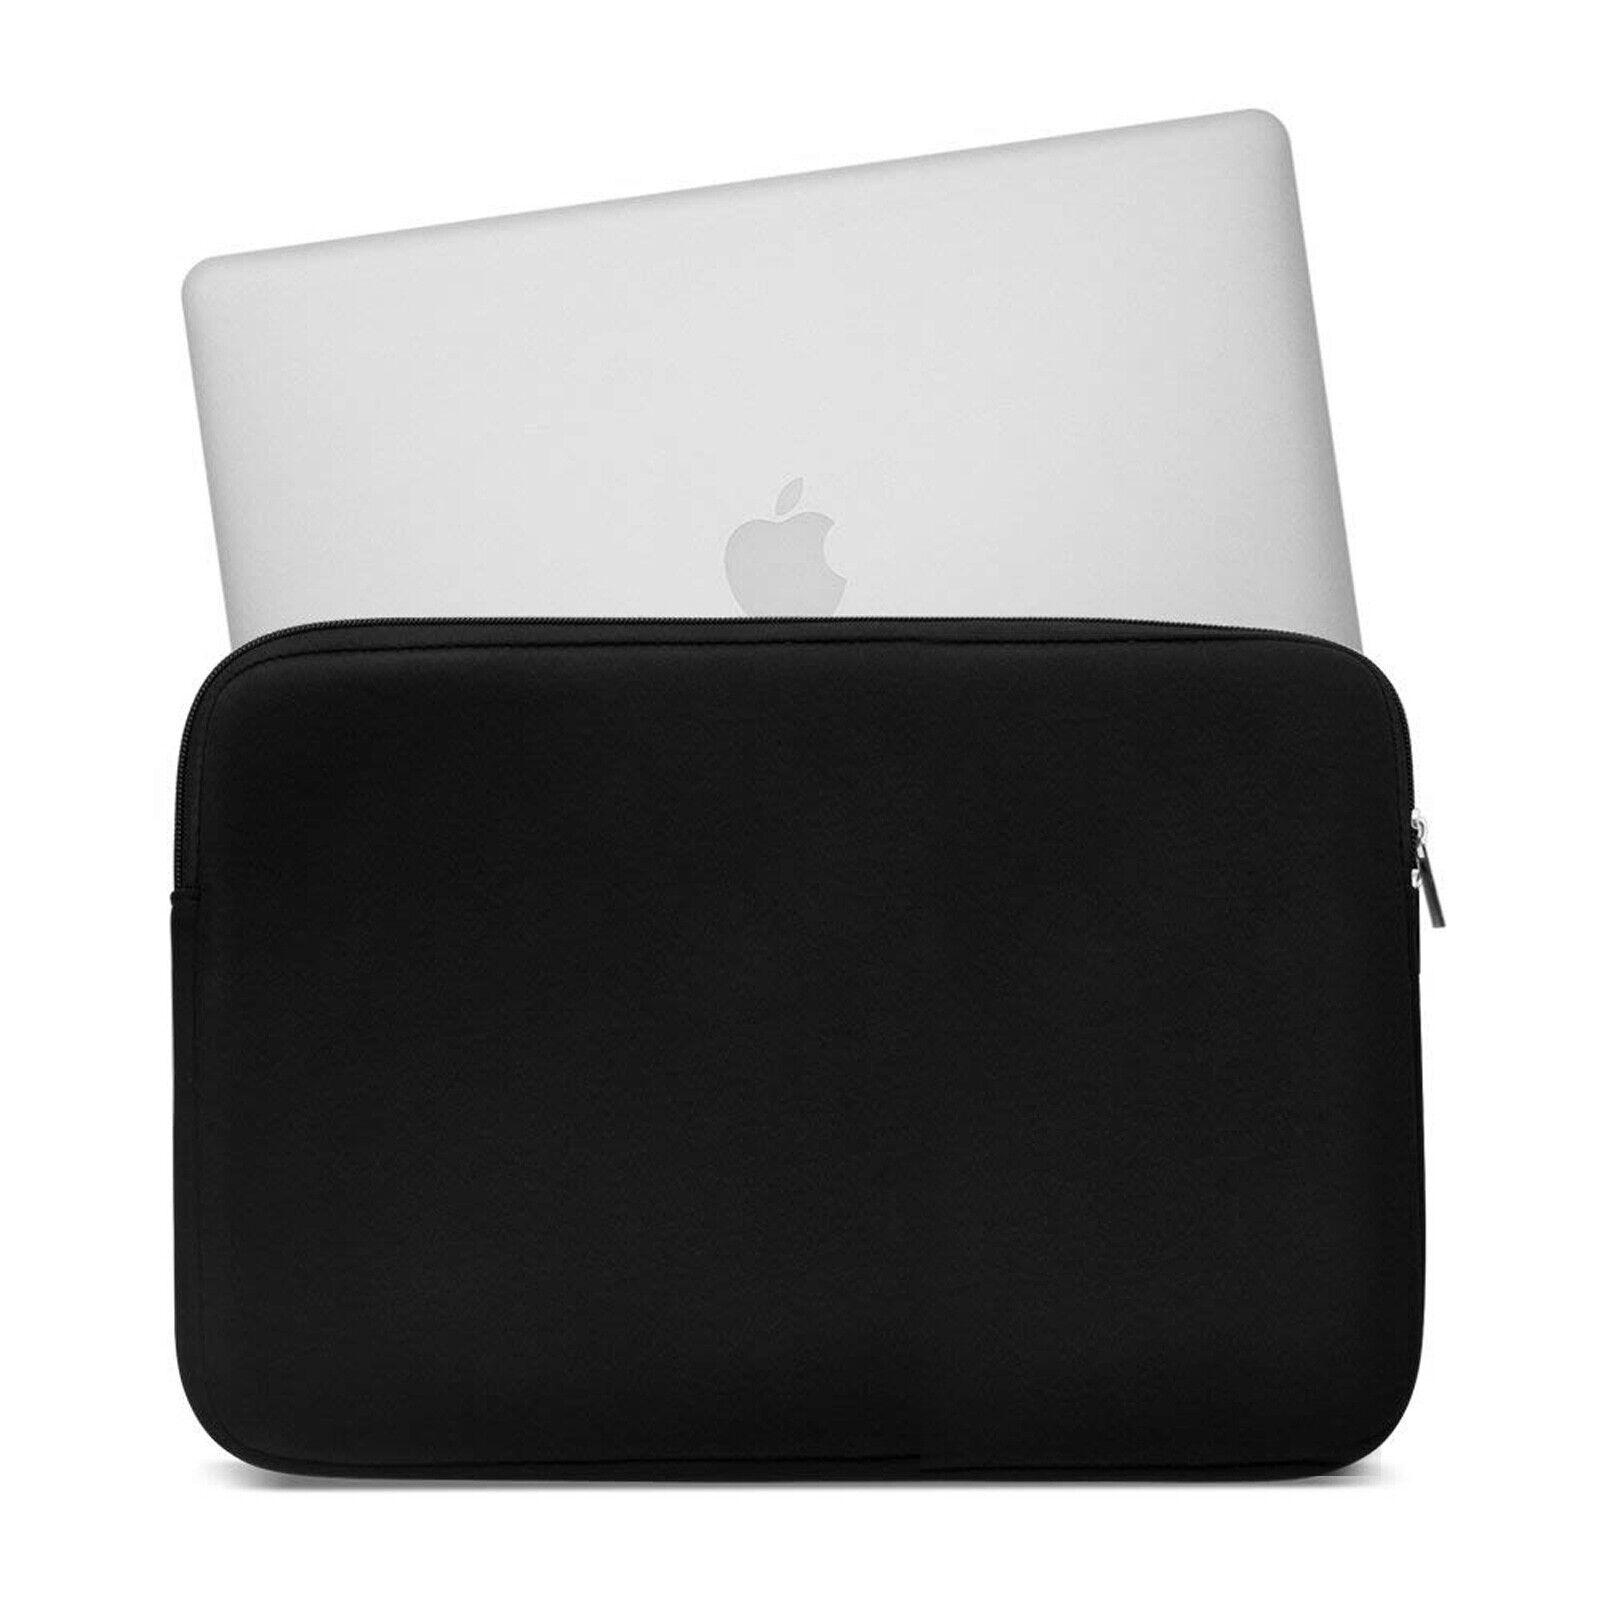 For Apple Macbook Air/Pro/Retina A2159 2019 iPad Soft Neopre